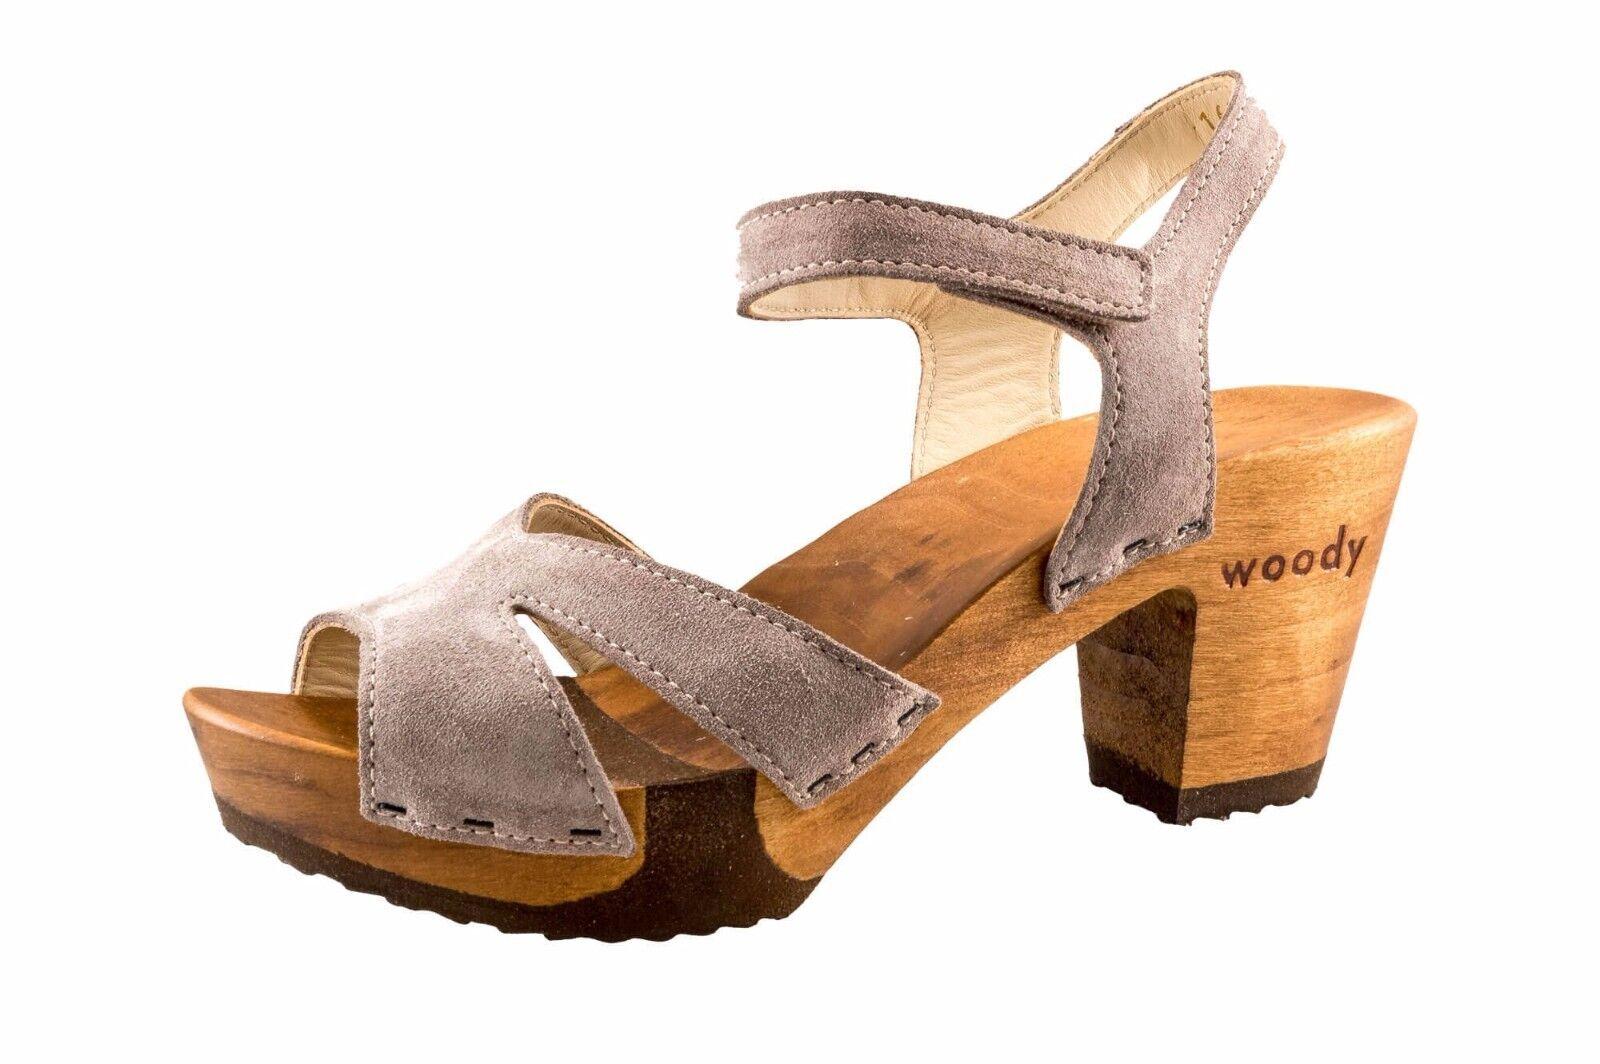 Woody Damen Sandalette wood-o-flex Carmen Taupe NEU Gr. 36 39